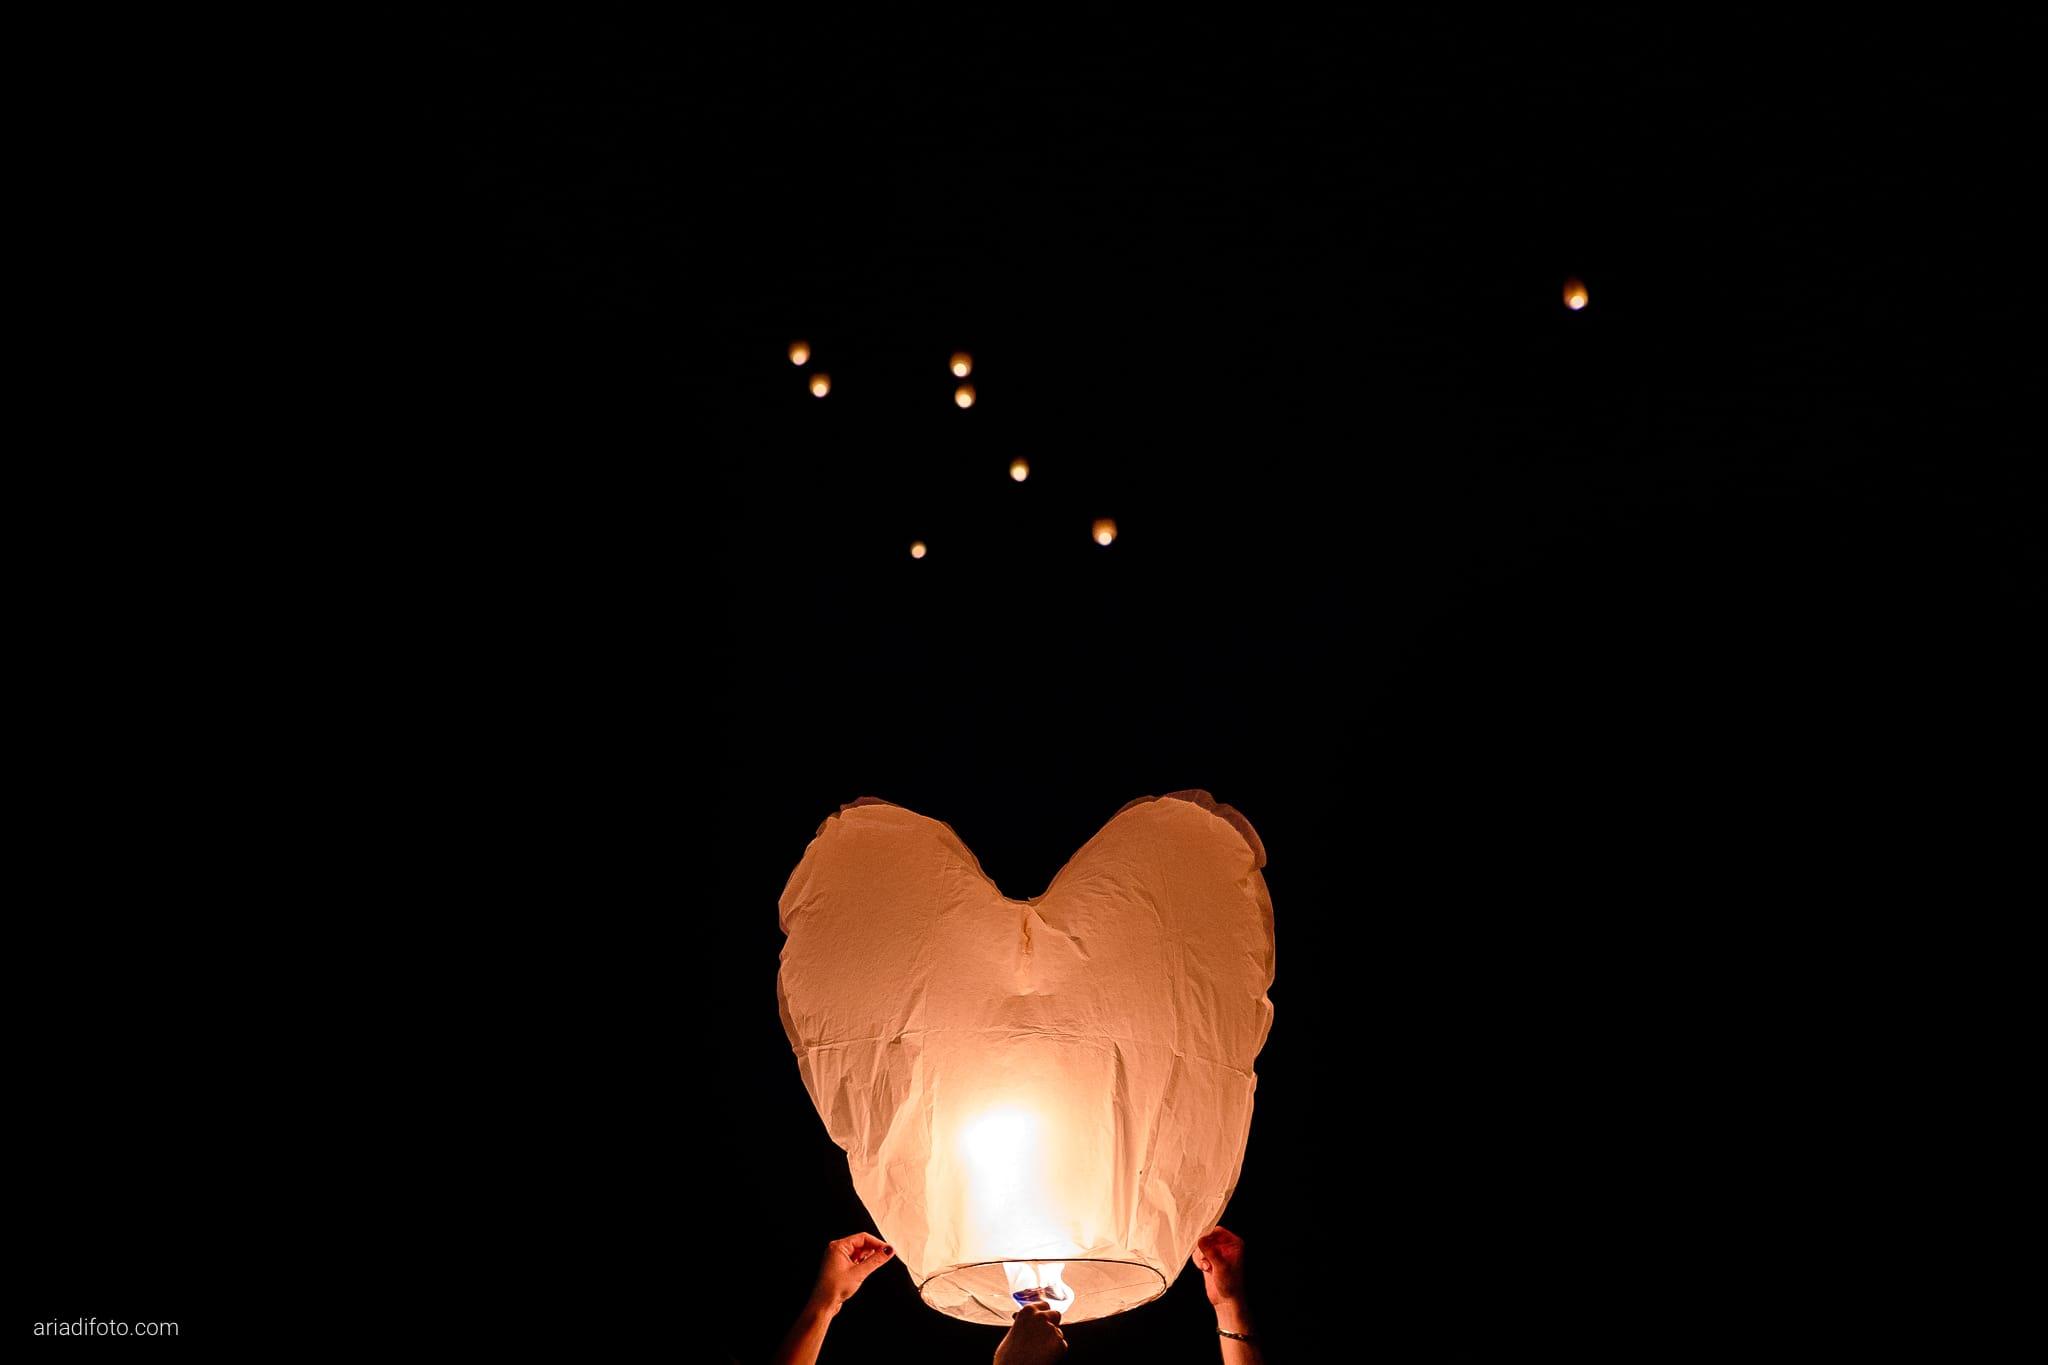 Melania Davide Matrimonio Monrupino Tavernetta Castello di Spessa Capriva Gorizia ricevimento lanterne